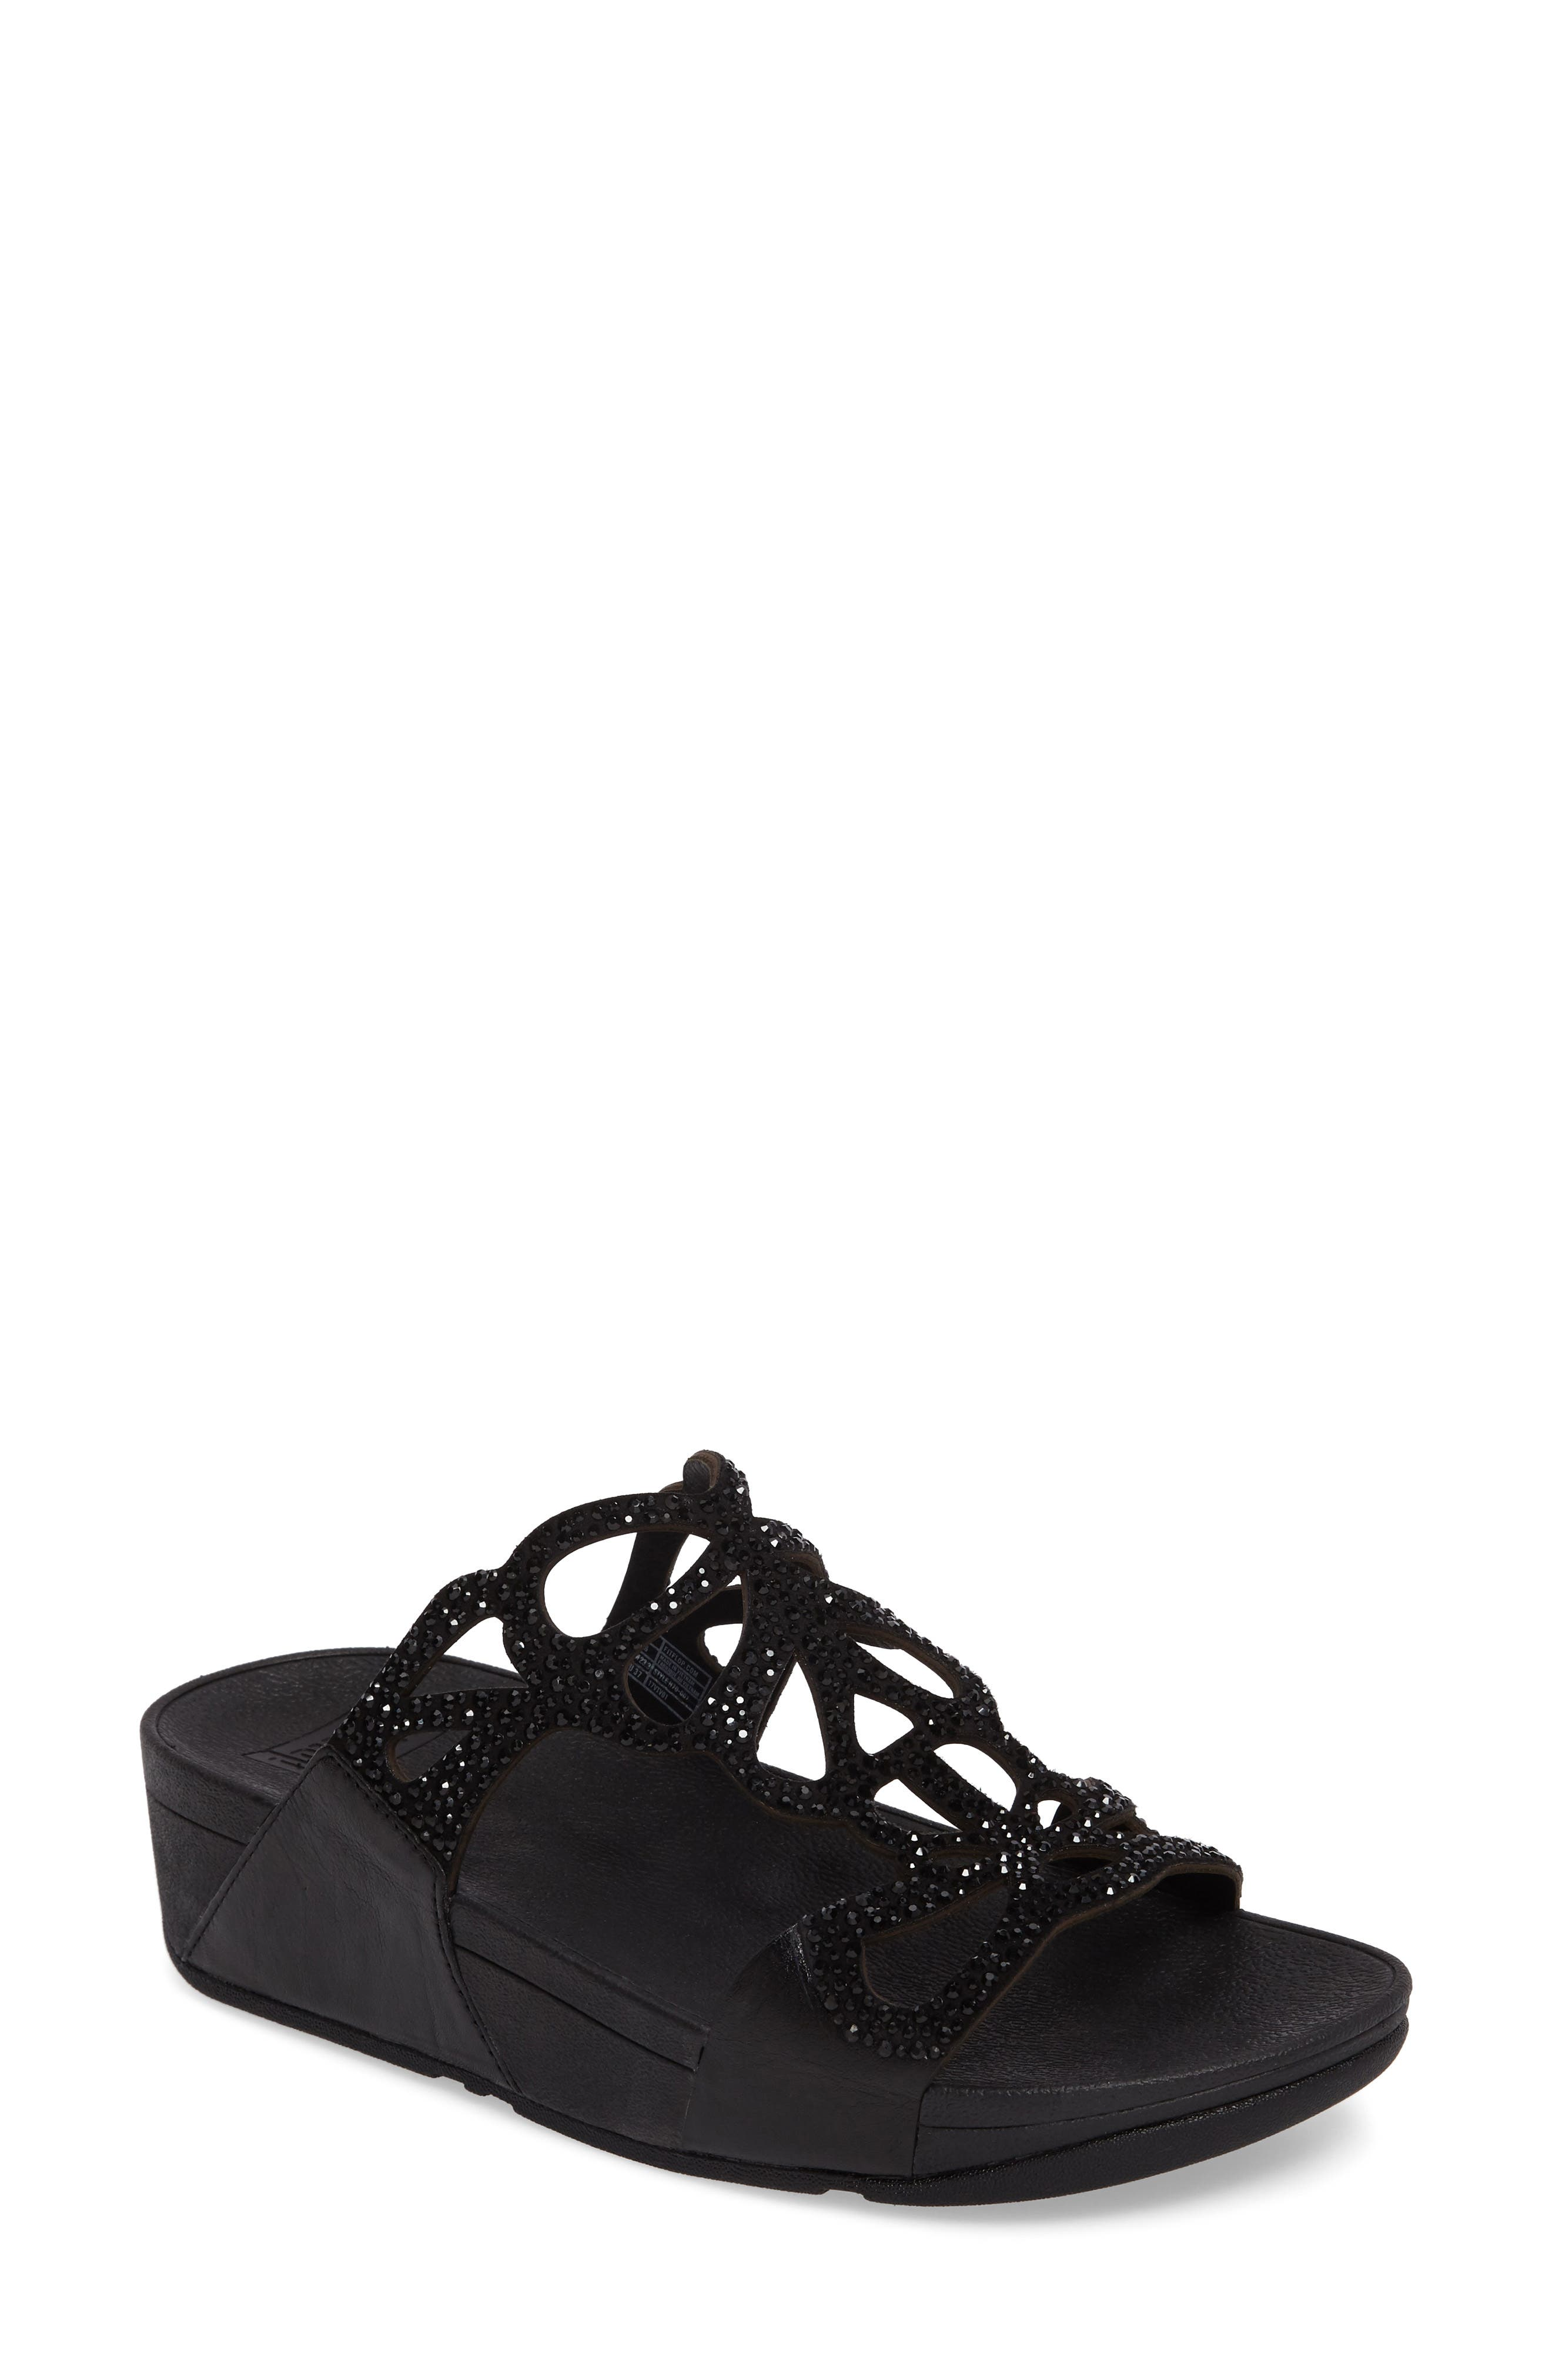 Bumble Wedge Slide Sandal,                             Main thumbnail 1, color,                             Black Leather